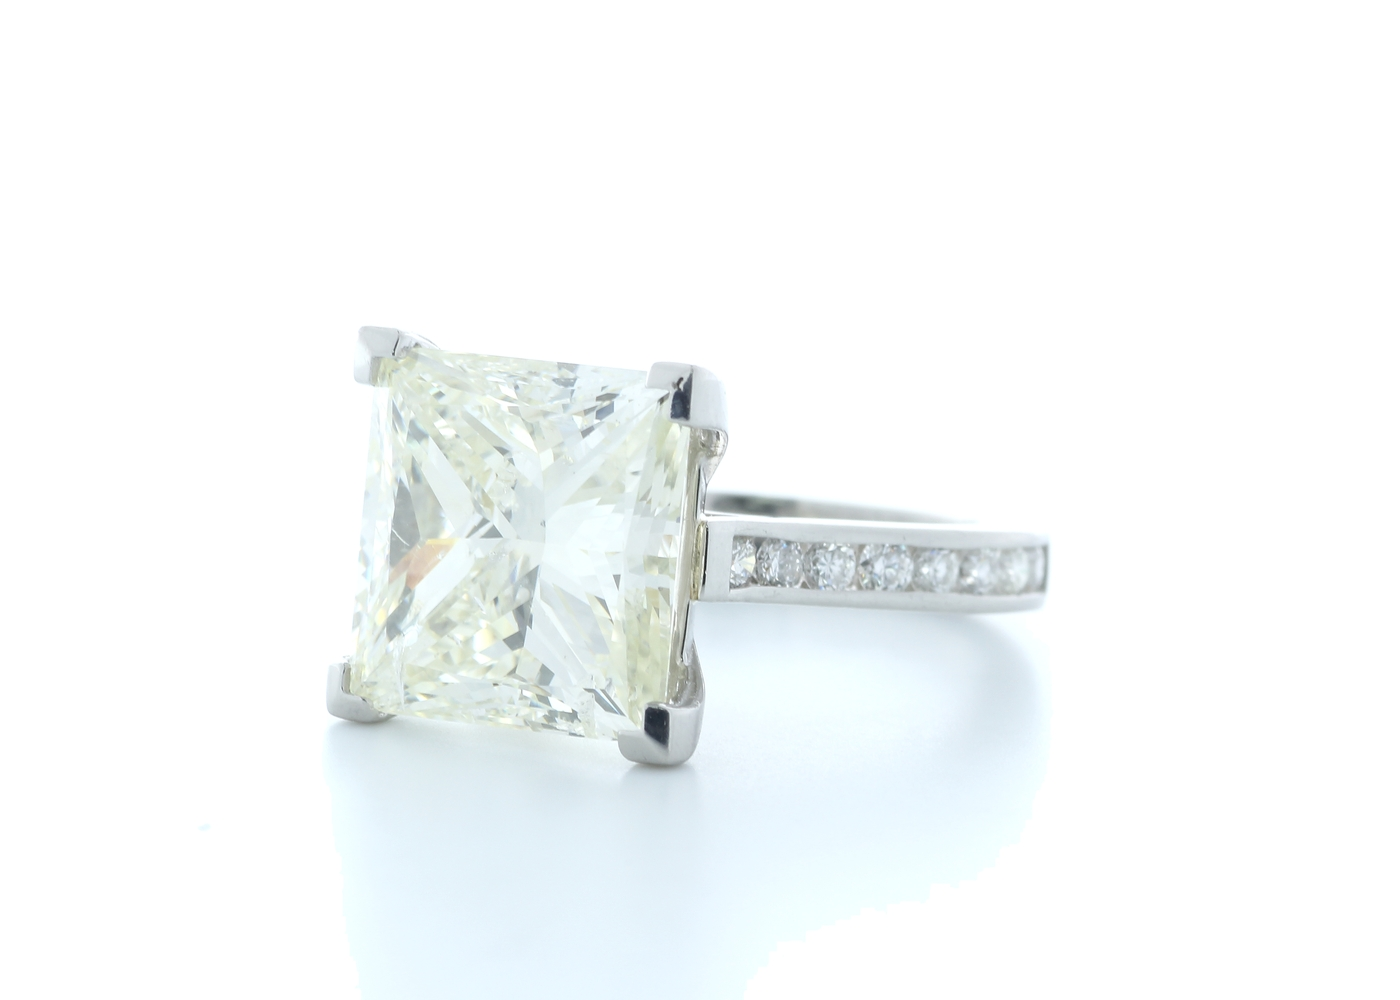 18ct White Gold Princess Cut Diamond Ring 10.00 Carats - Image 2 of 5